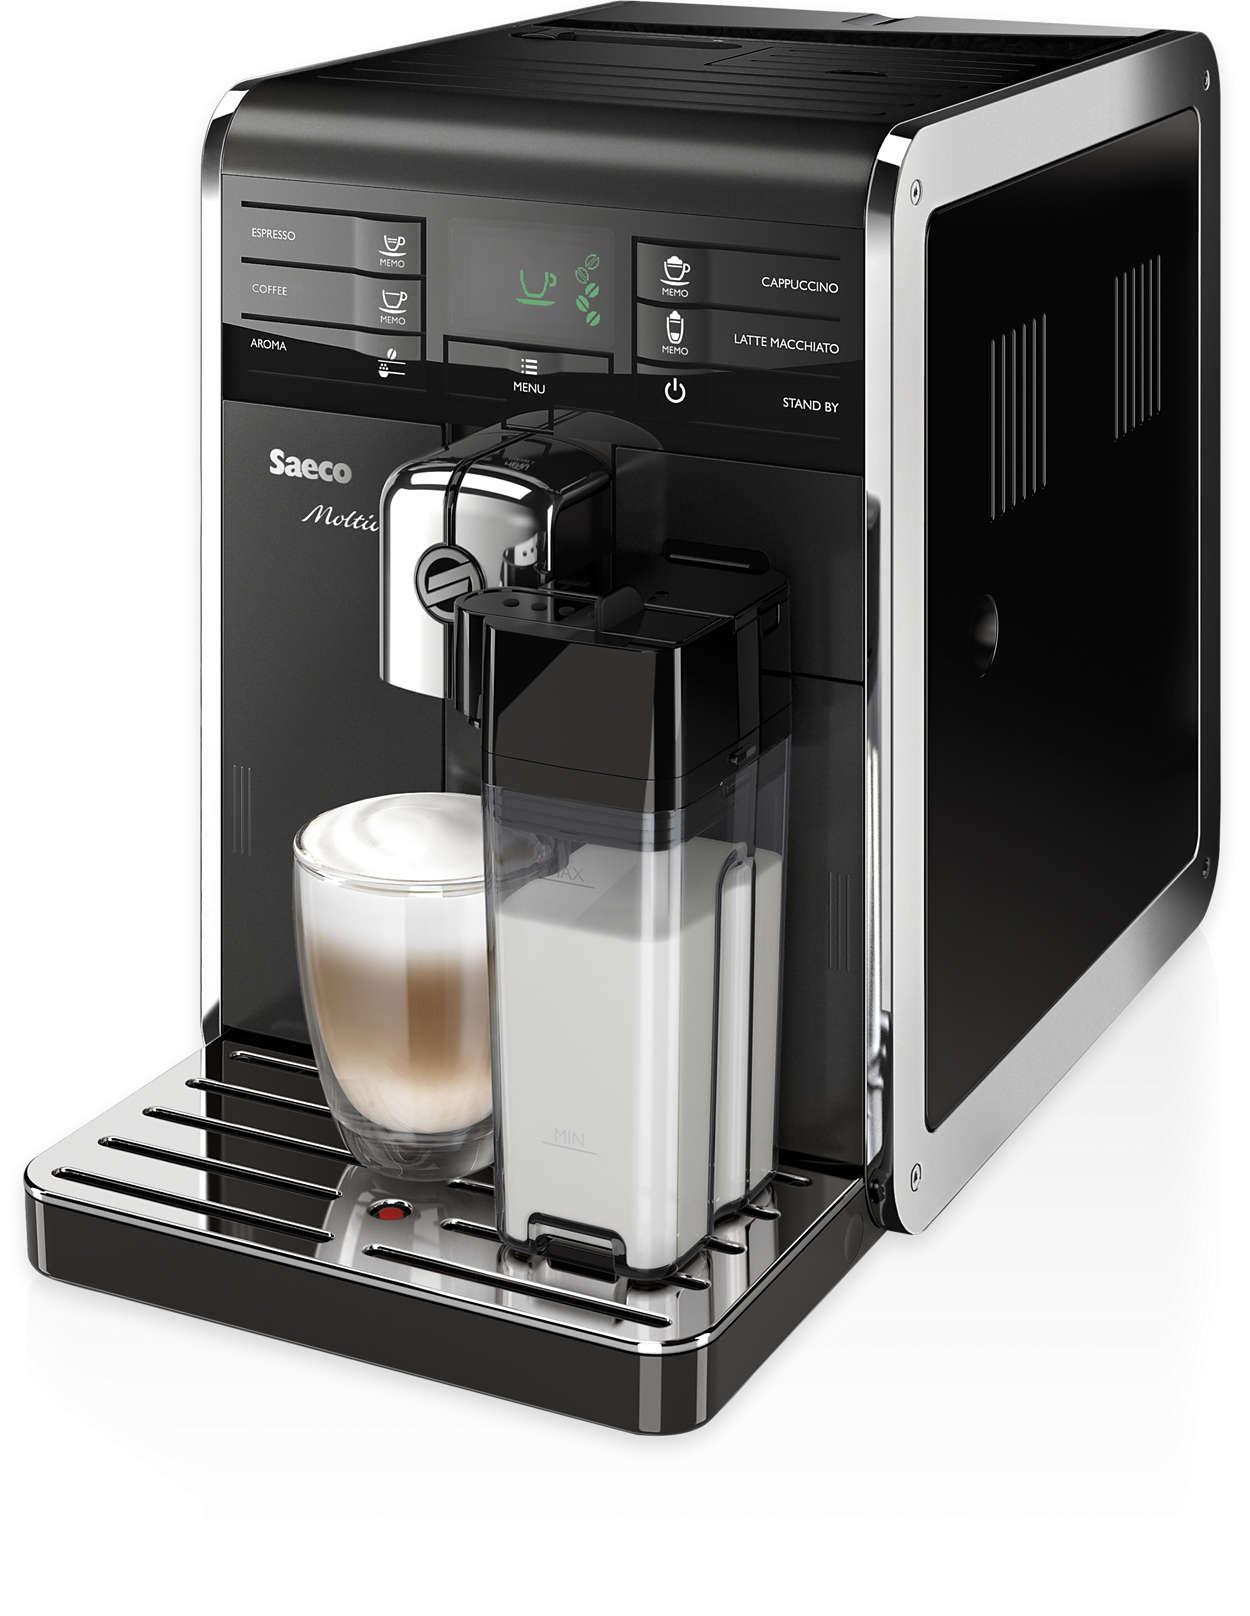 Machine A Cafe Saeco Moltio Accessoires